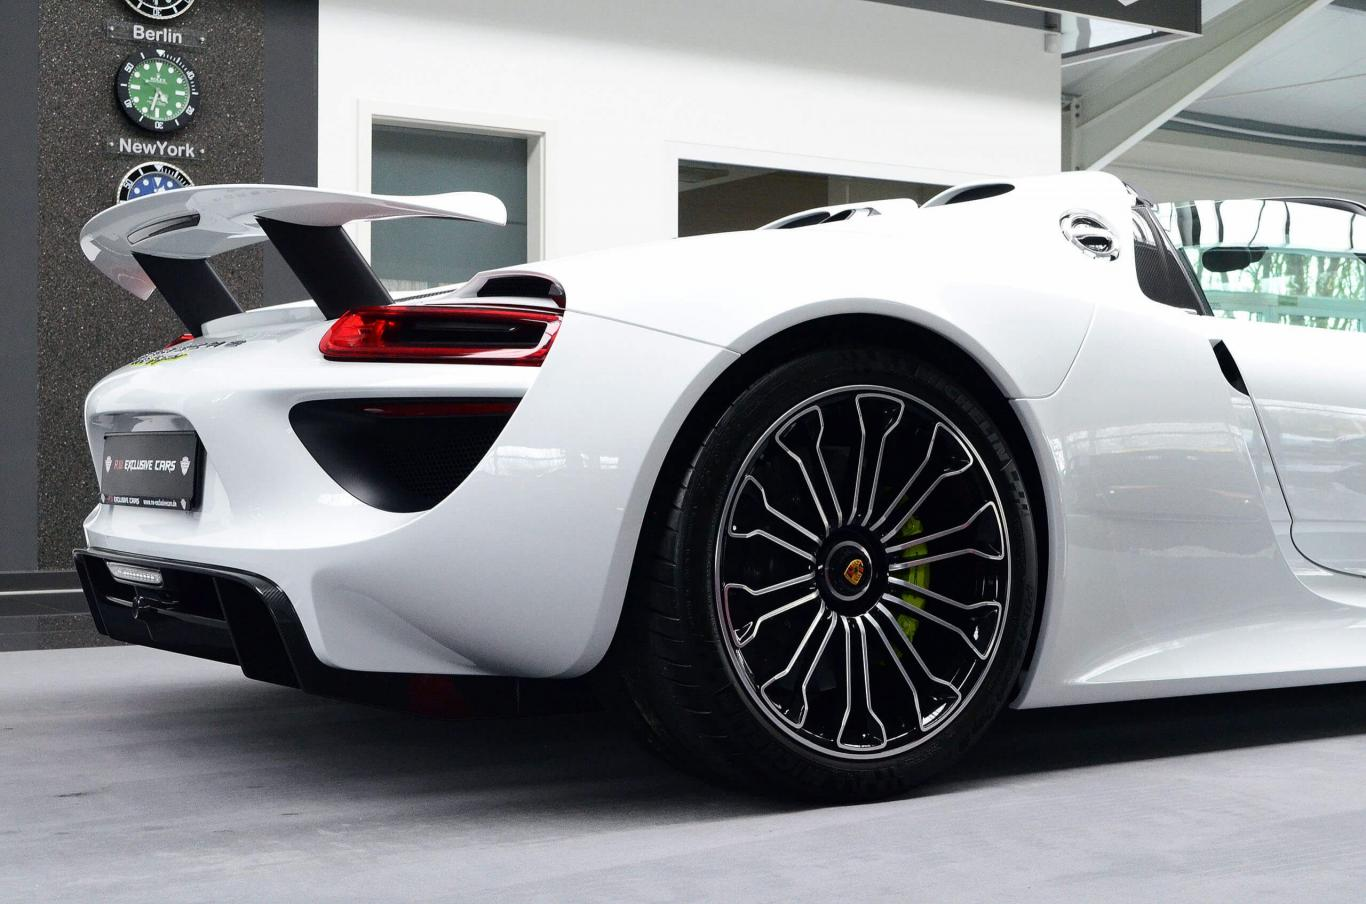 Porsche 918 Spyder Newcar Onstock White Red Carbon Lift